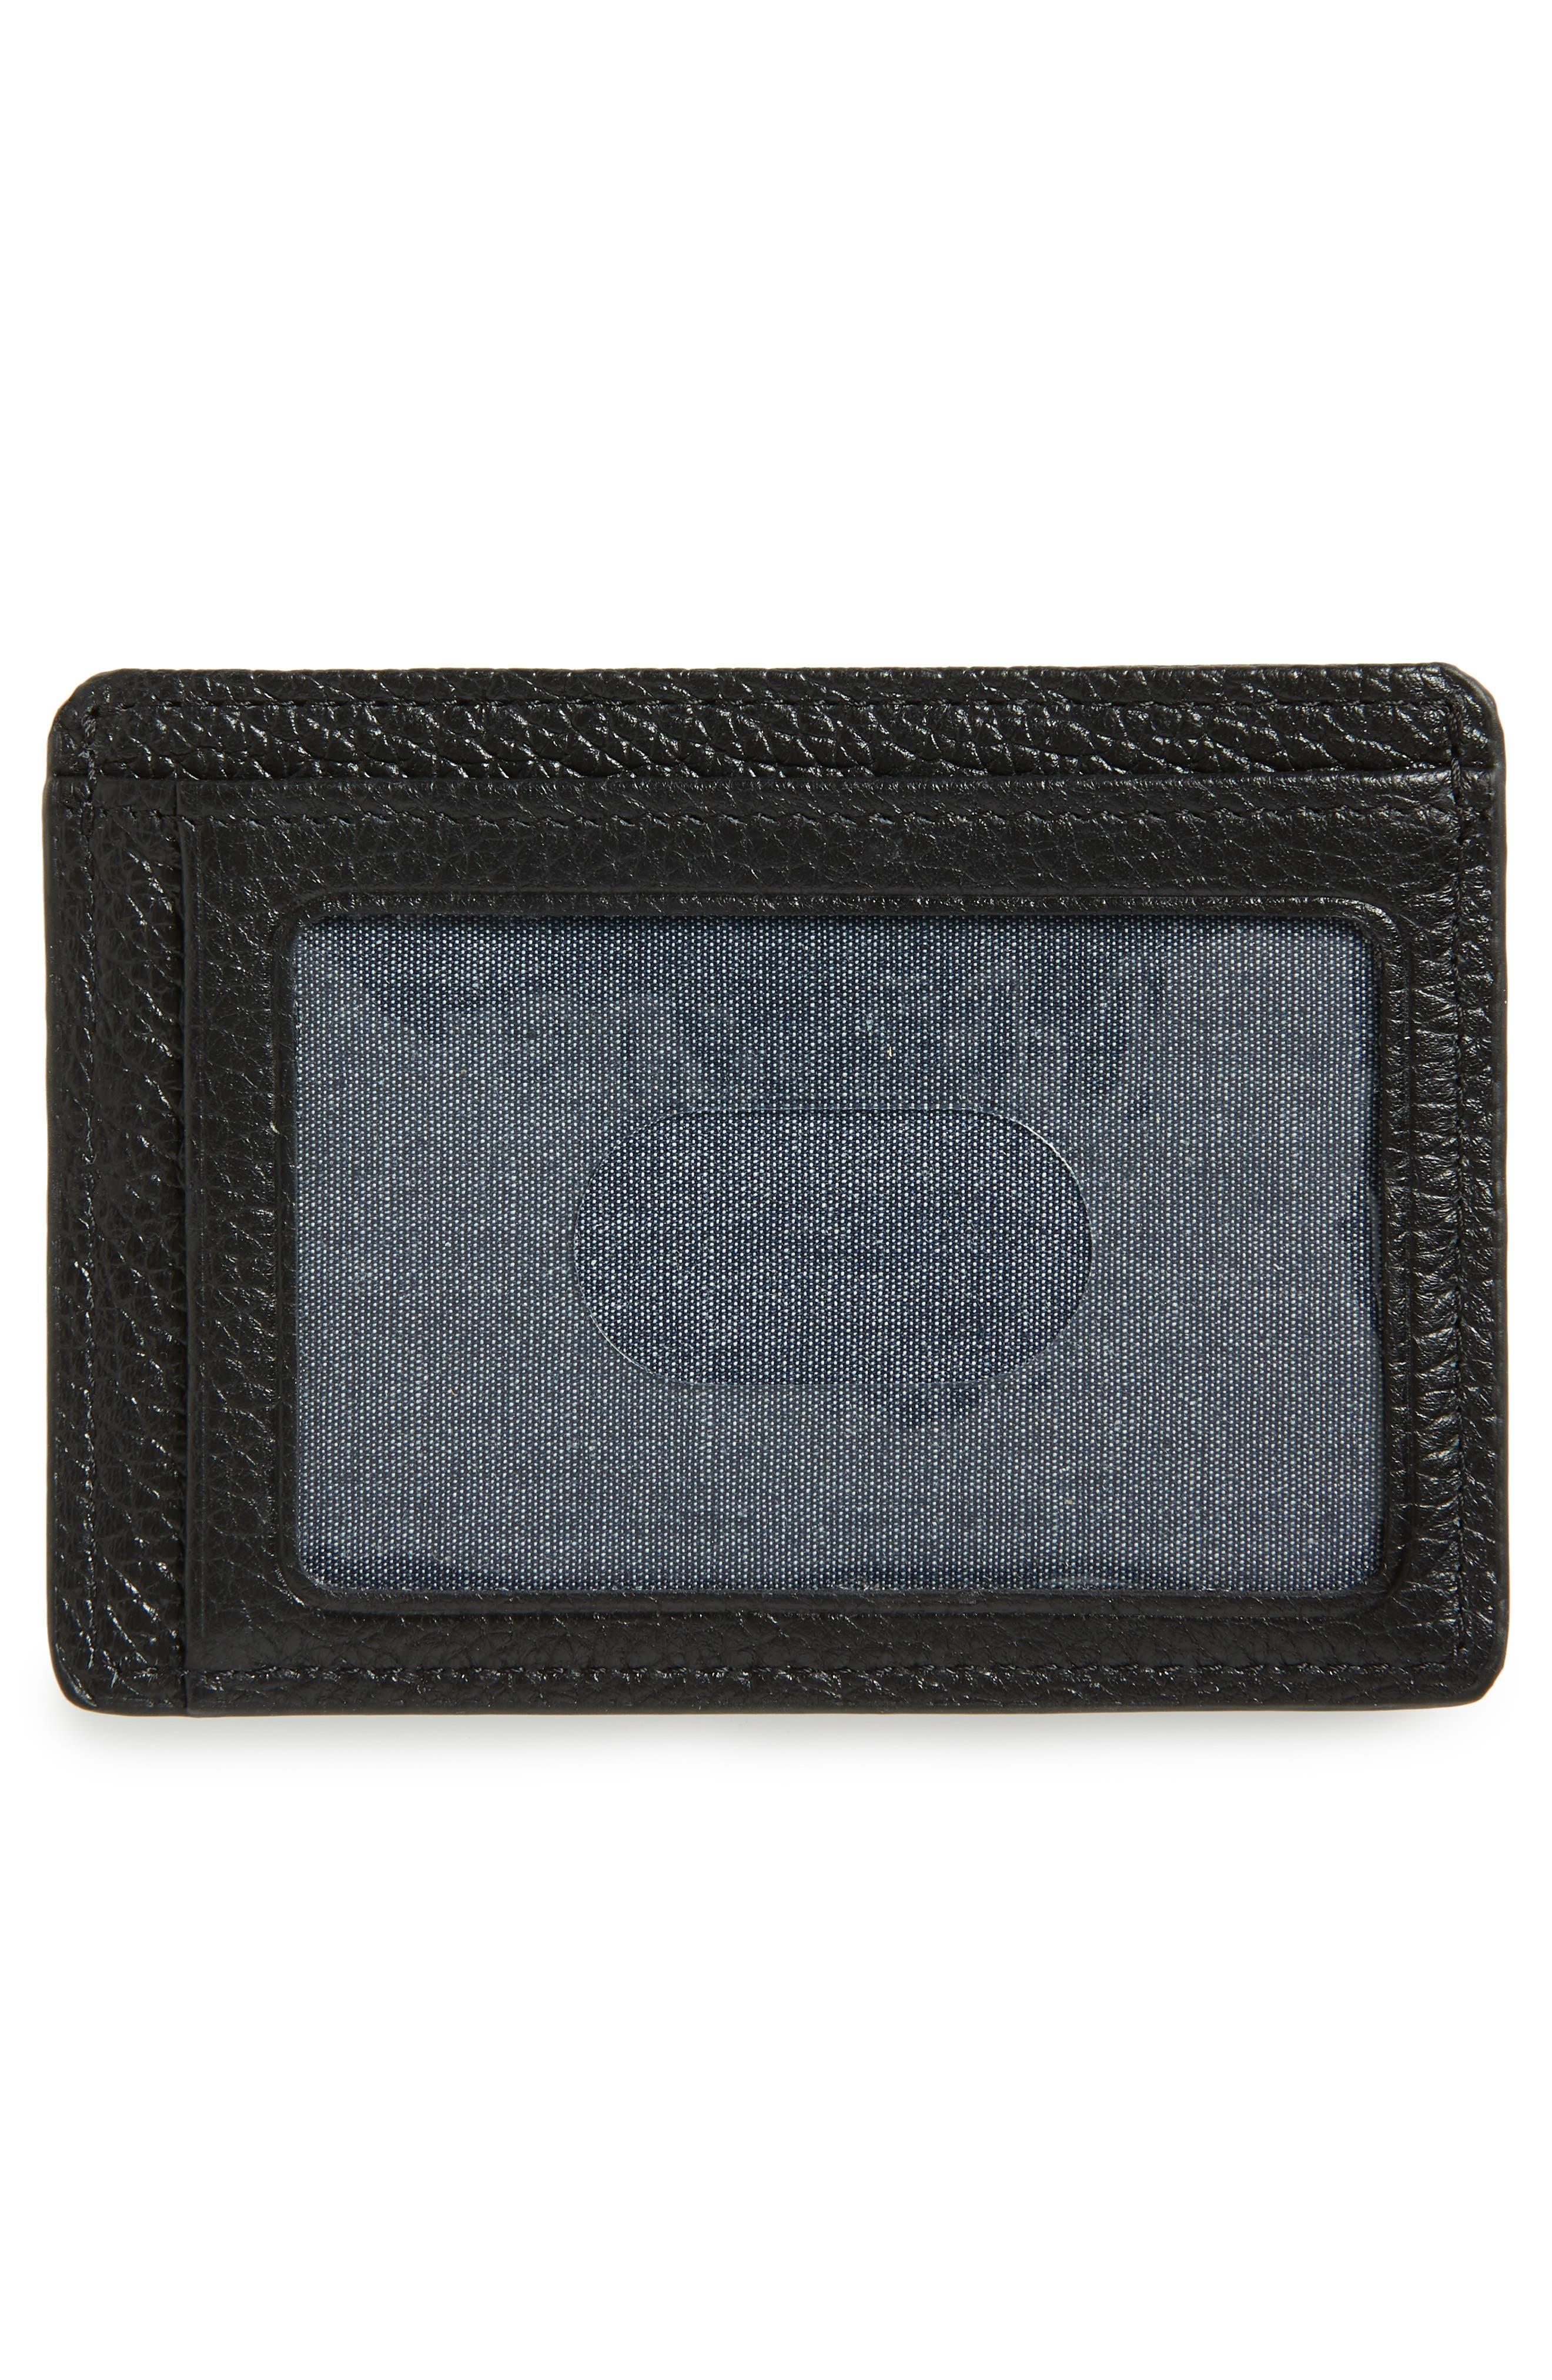 Midland RFID Leather Card Case,                             Alternate thumbnail 2, color,                             BLACK